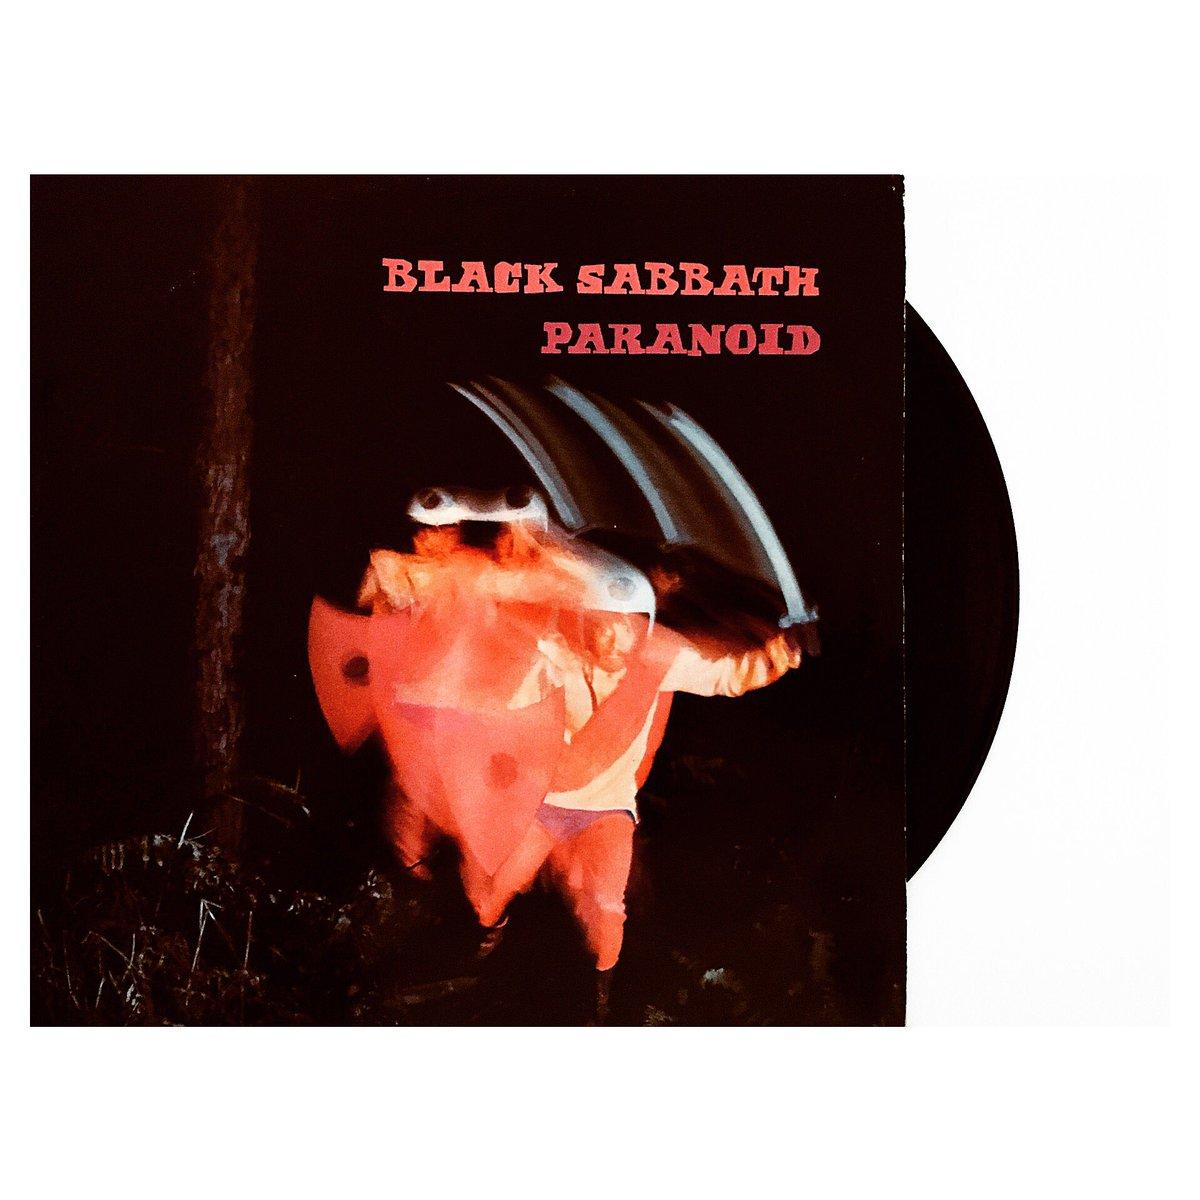 Black Sabbath/Paranoid #classic #lunes #dilluns #monday #blacksabbath <br>http://pic.twitter.com/SlccZVPbQ4